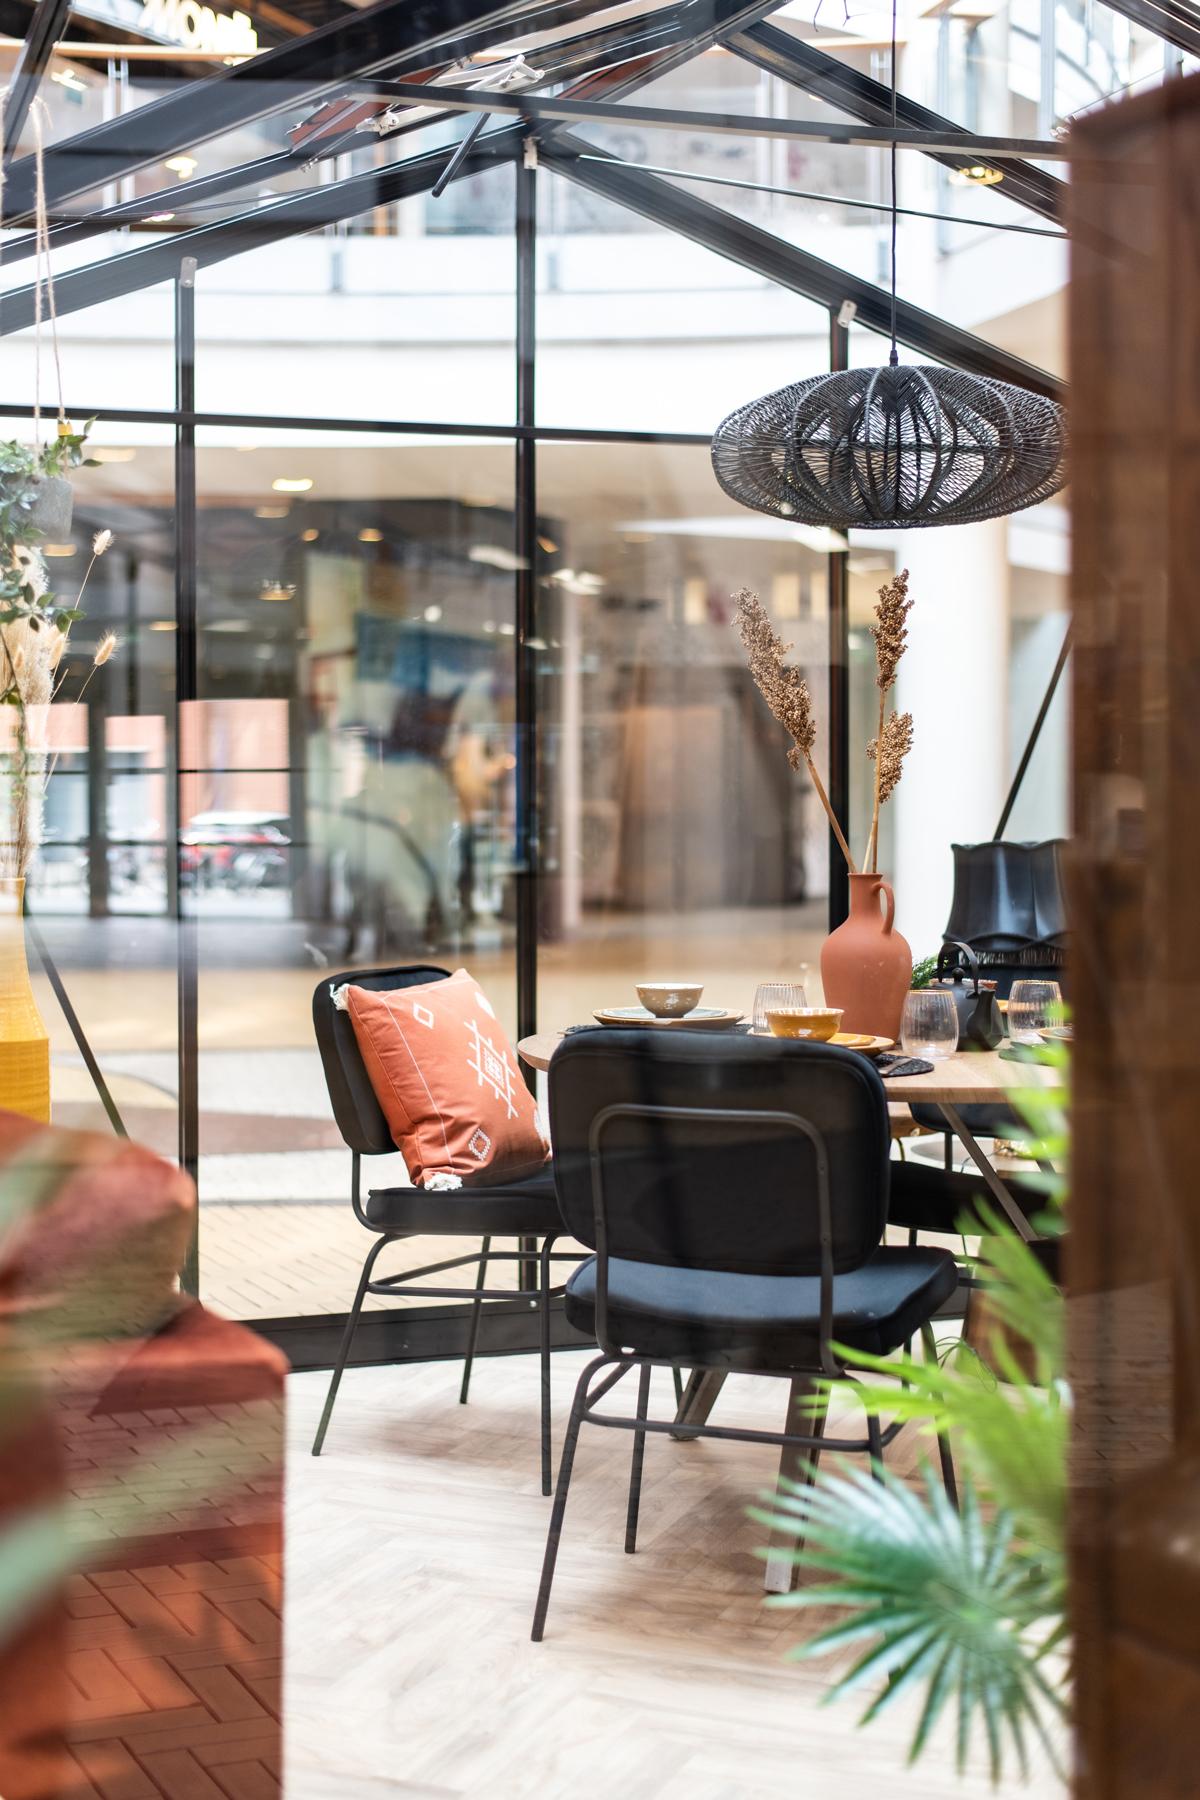 keeelly91 interieurstyling interieurfotograaf vintage chique megastores Den Haag styling opdracht